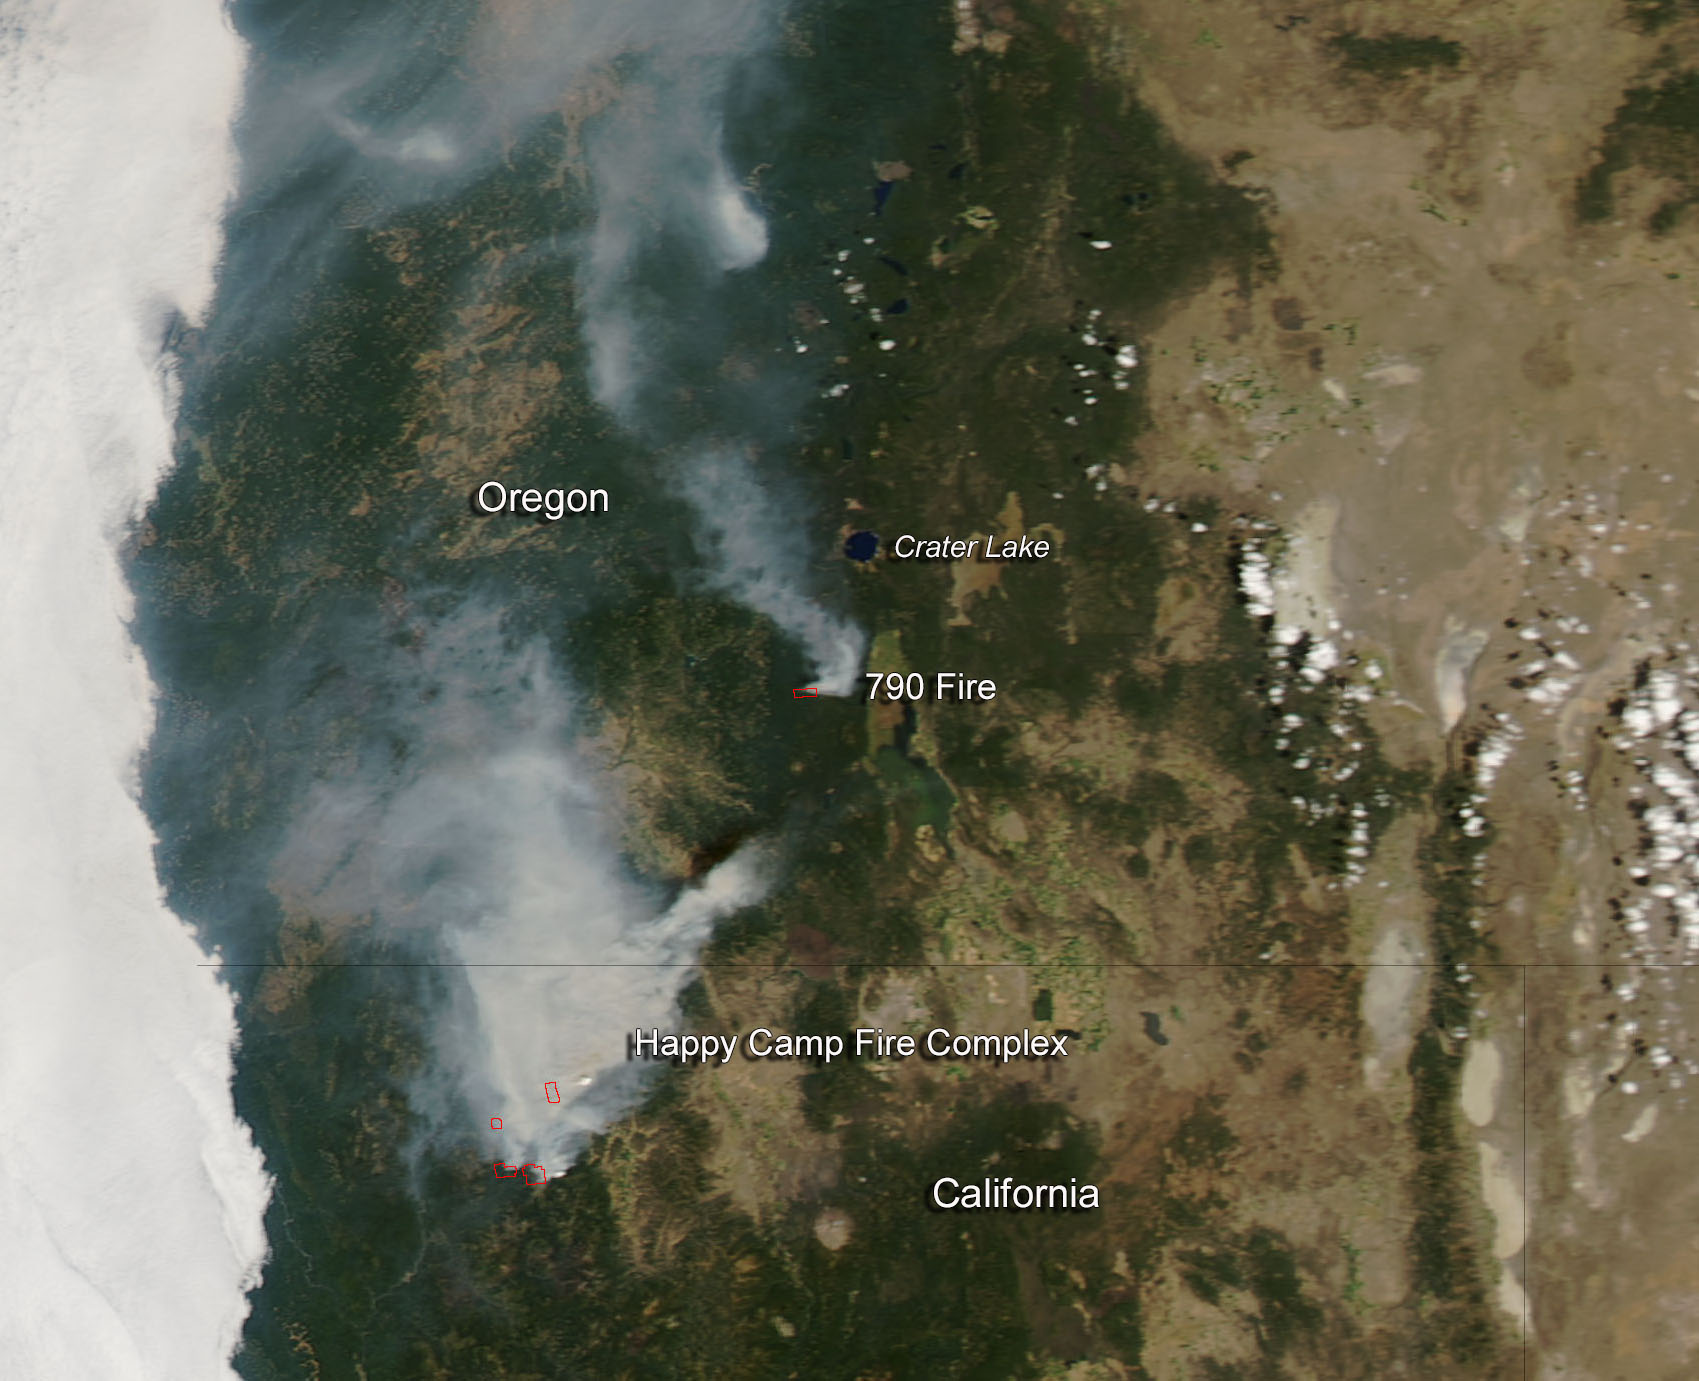 Happy Camp Fire in California and 790 Fire in Oregon | NASA